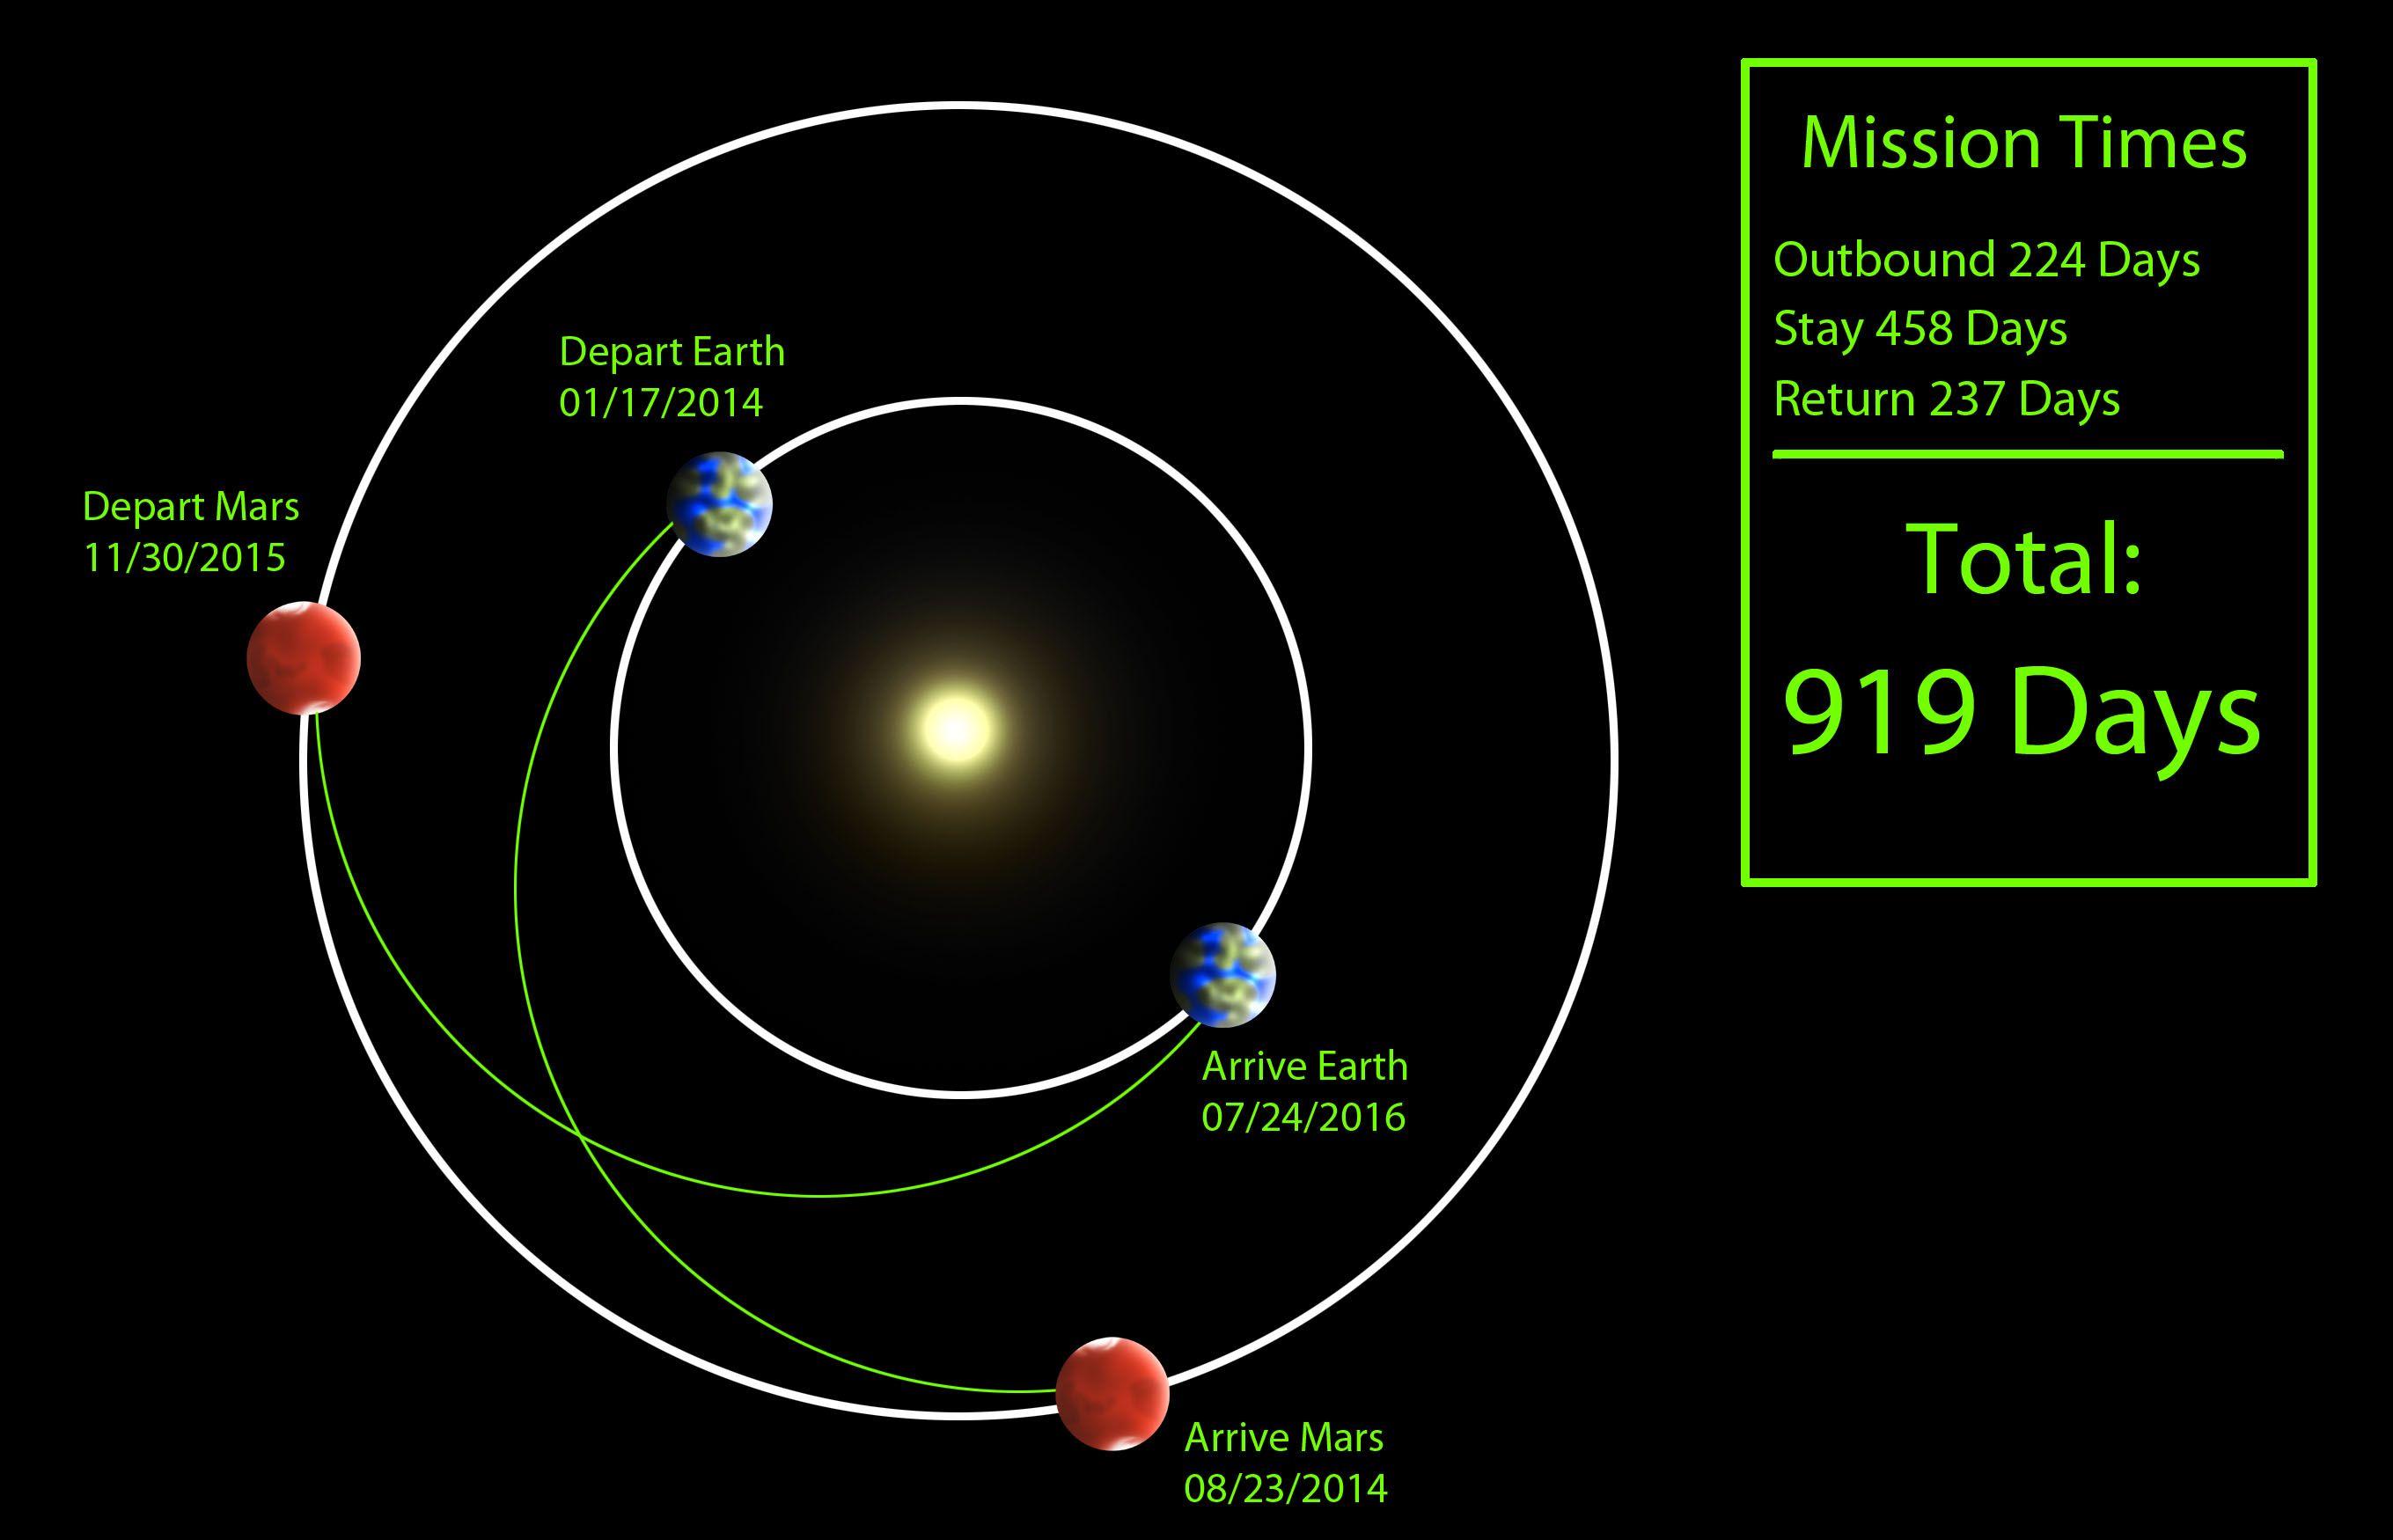 25b25b5d769e98522b804a8203acc436 - How Long Does It Take To Get Around The Earth